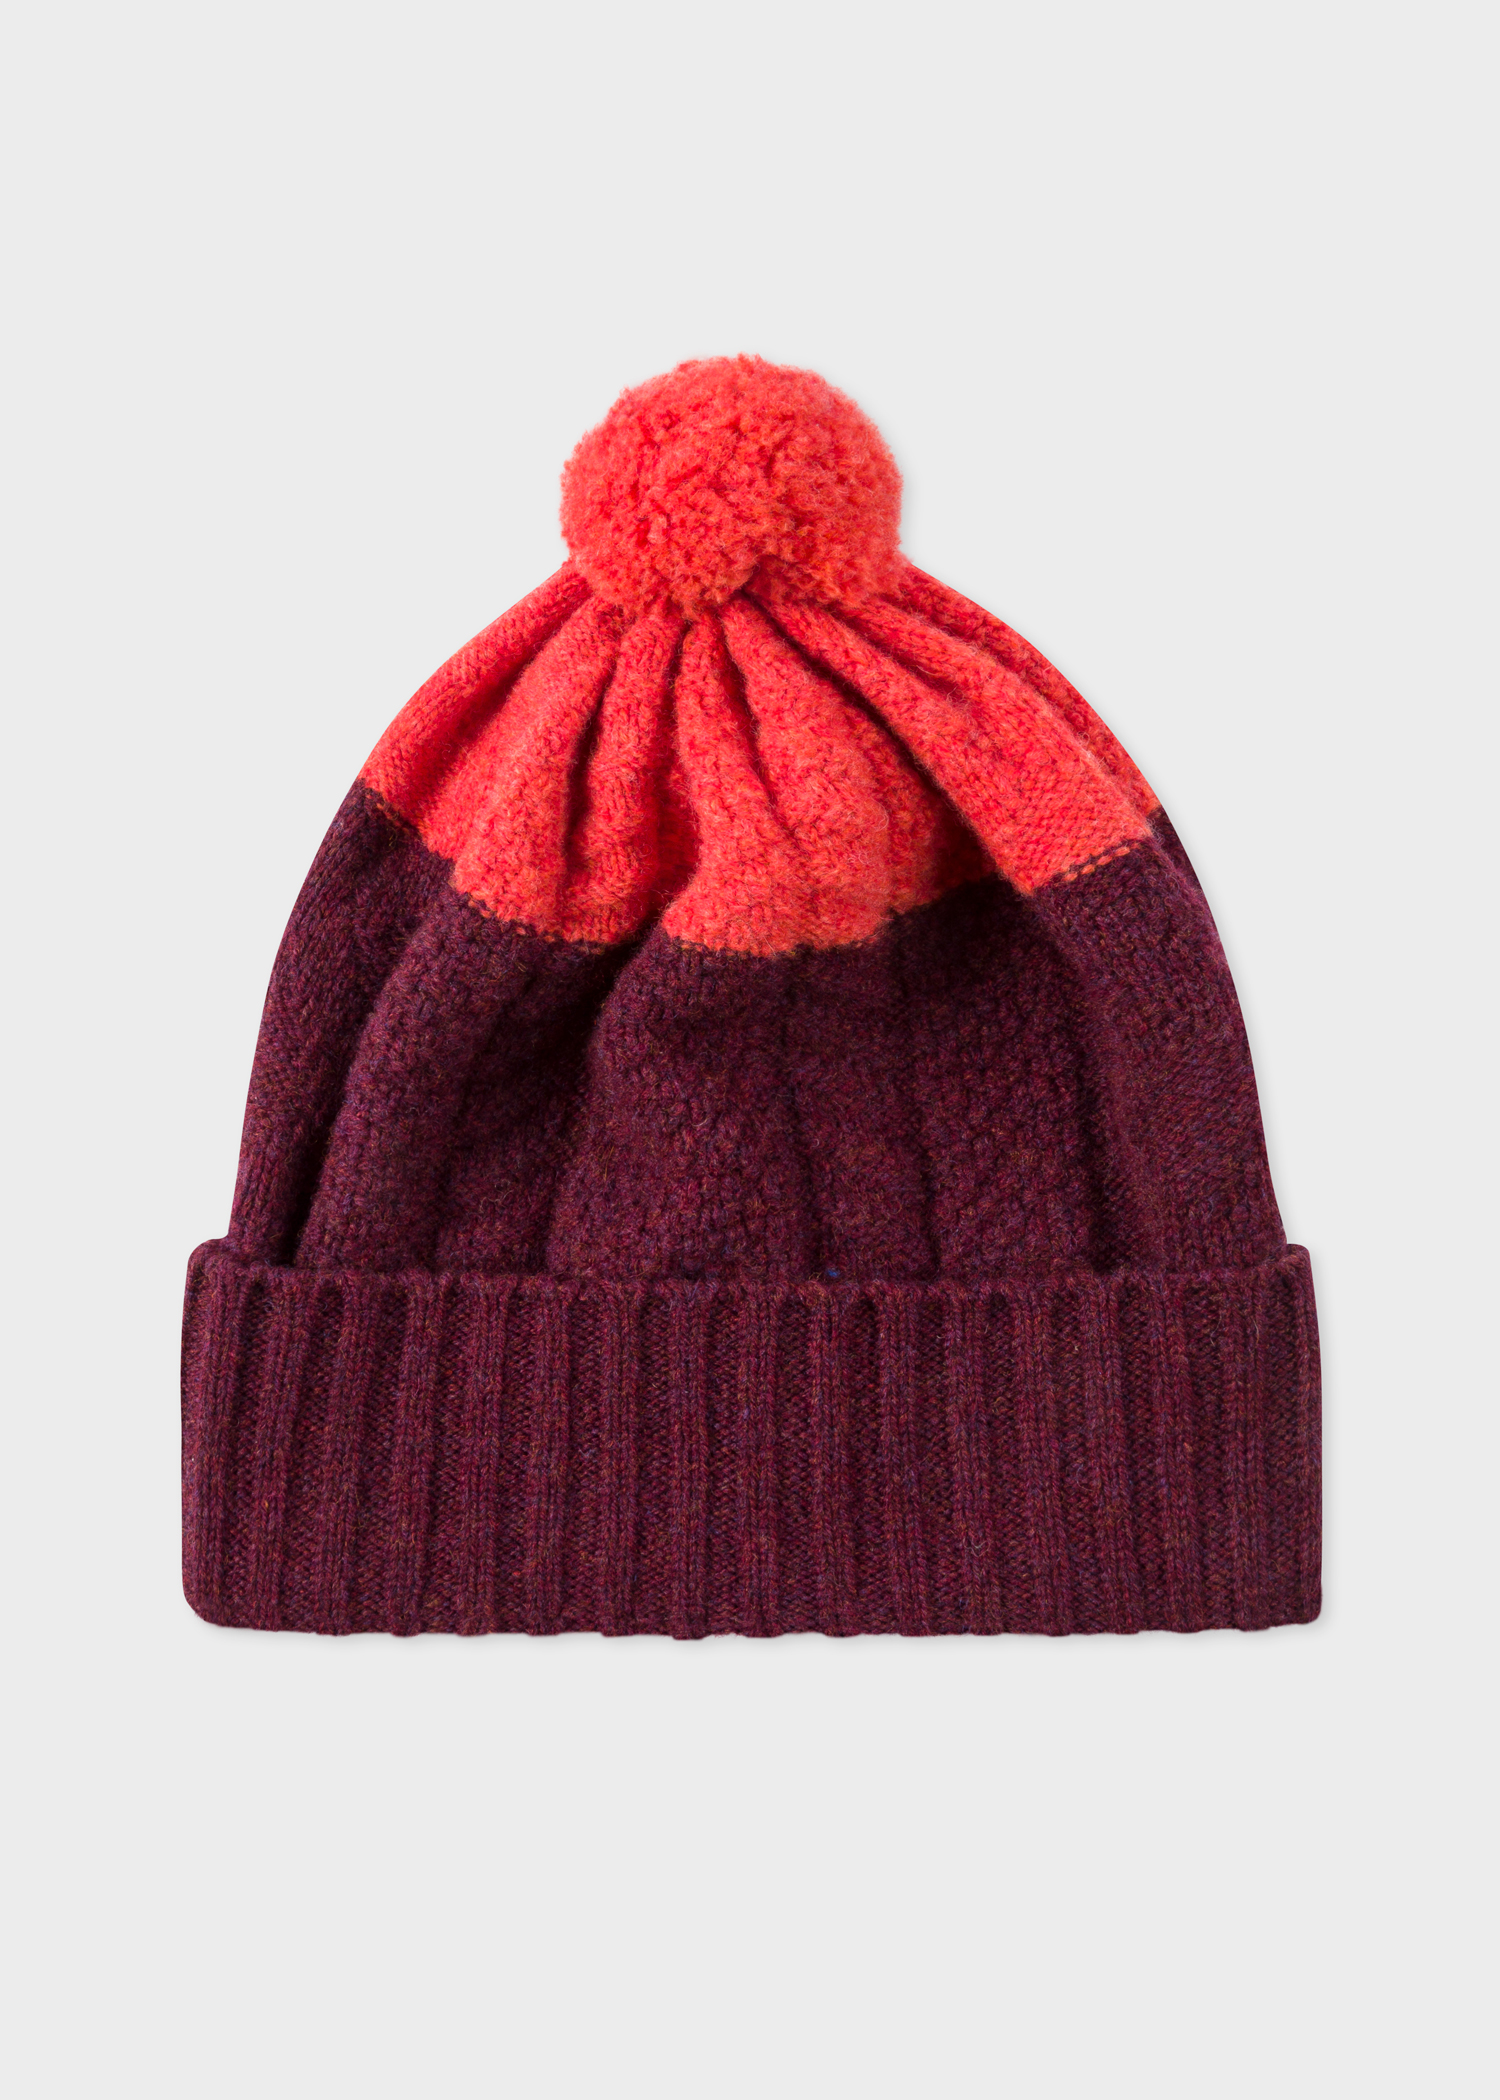 22dd90995ce Men s Burgundy Cable-Knit Wool Beanie Hat - Paul Smith Australia